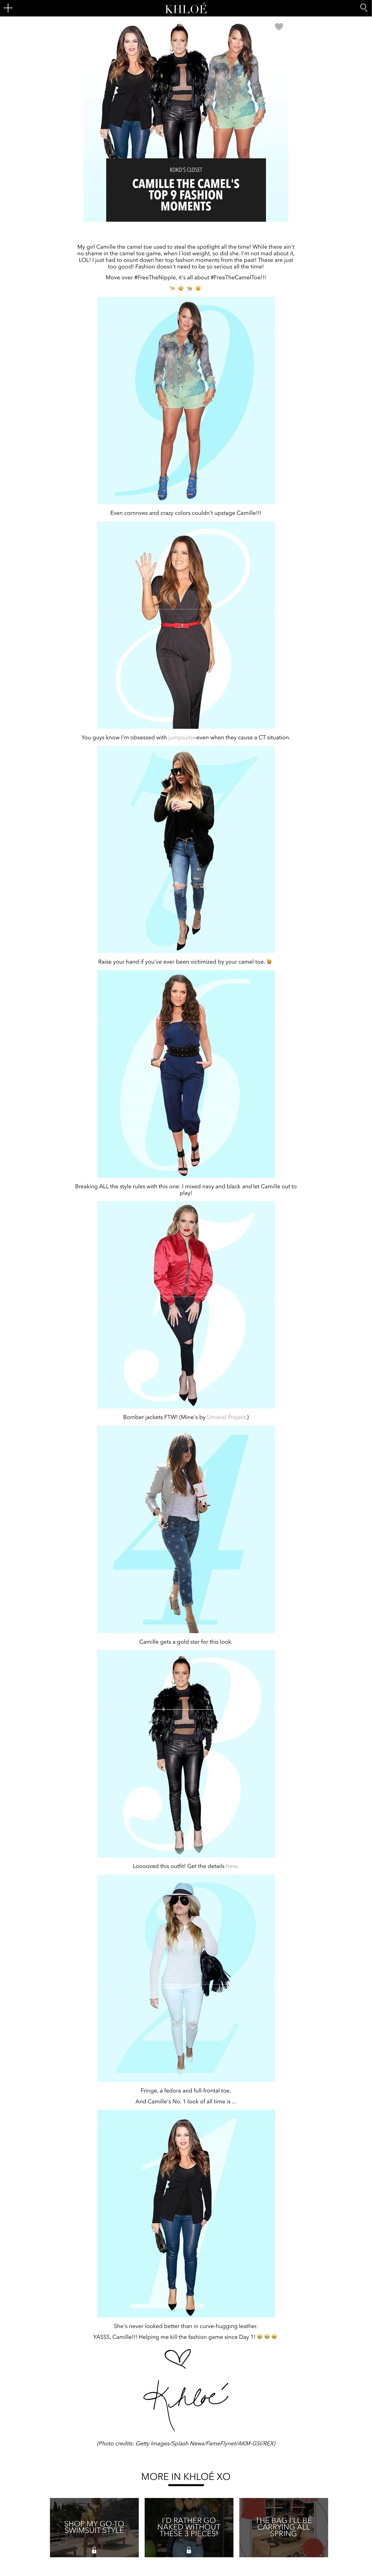 screencapture-khloewithak-xo-505-khloe-kardashian-camille-camels-top-fashion-moments-2018-06-01-13_50_02.png